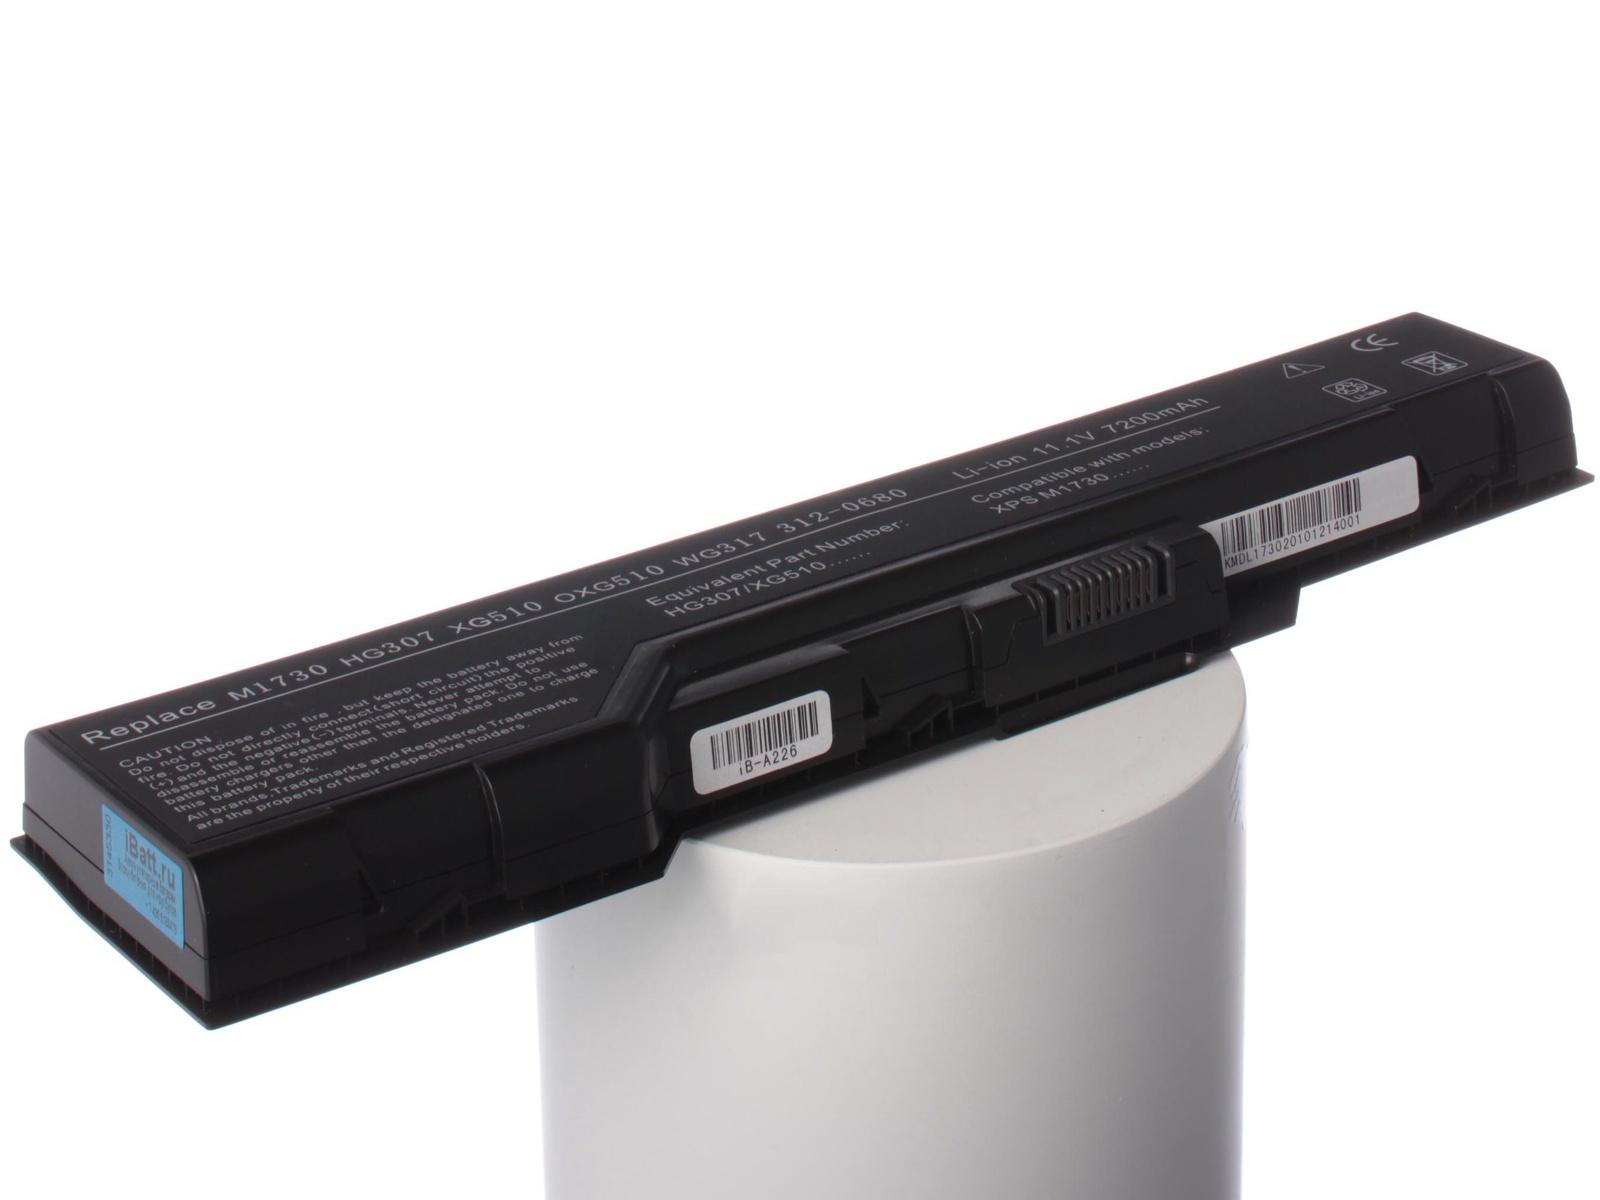 Аккумулятор для ноутбука iBatt Dell HG307, XG510 не заряжается батарея ноутбука